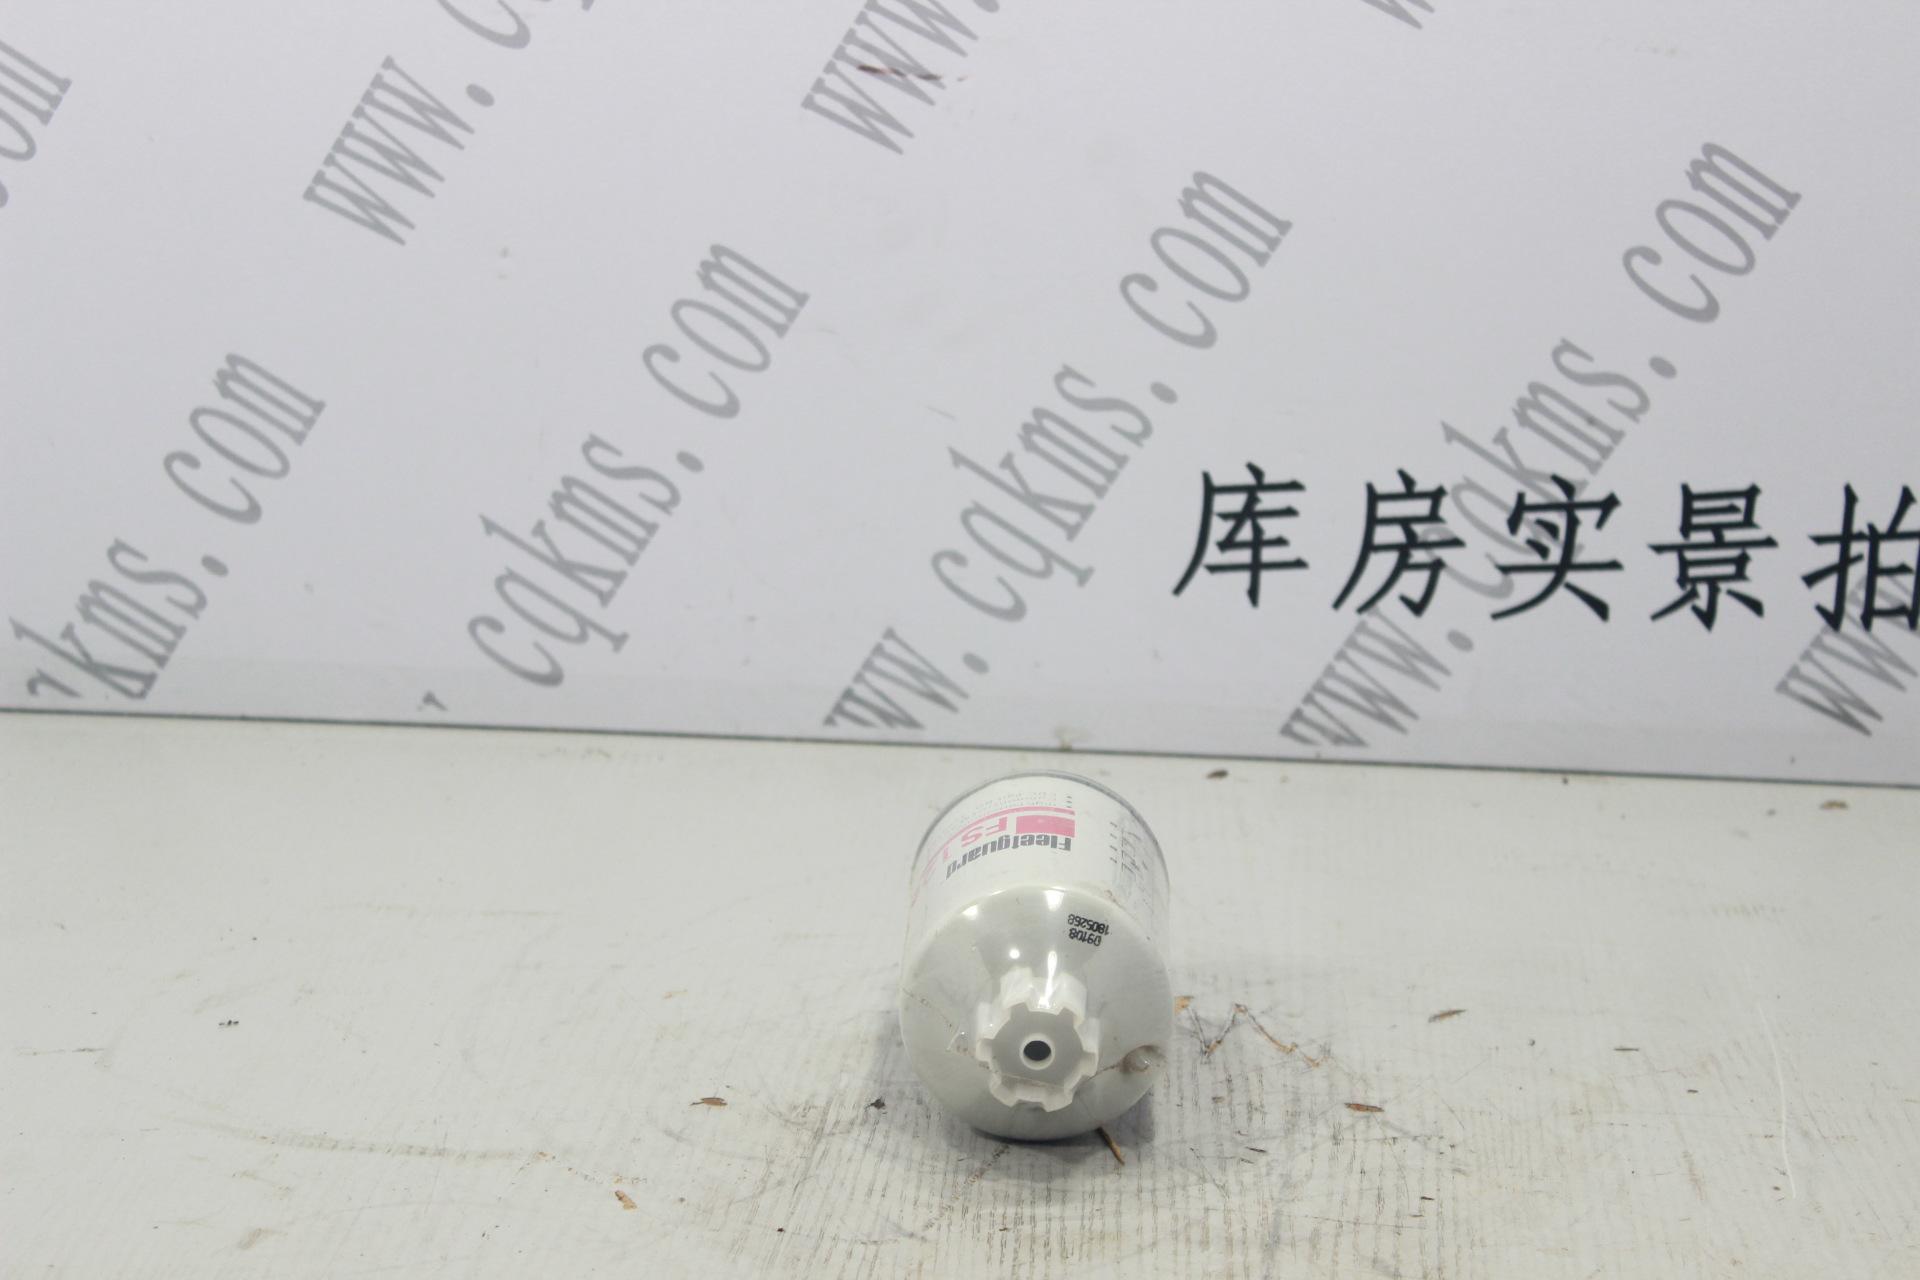 kms01682-FS1251-燃油滤清器----参考重量450-450图片5